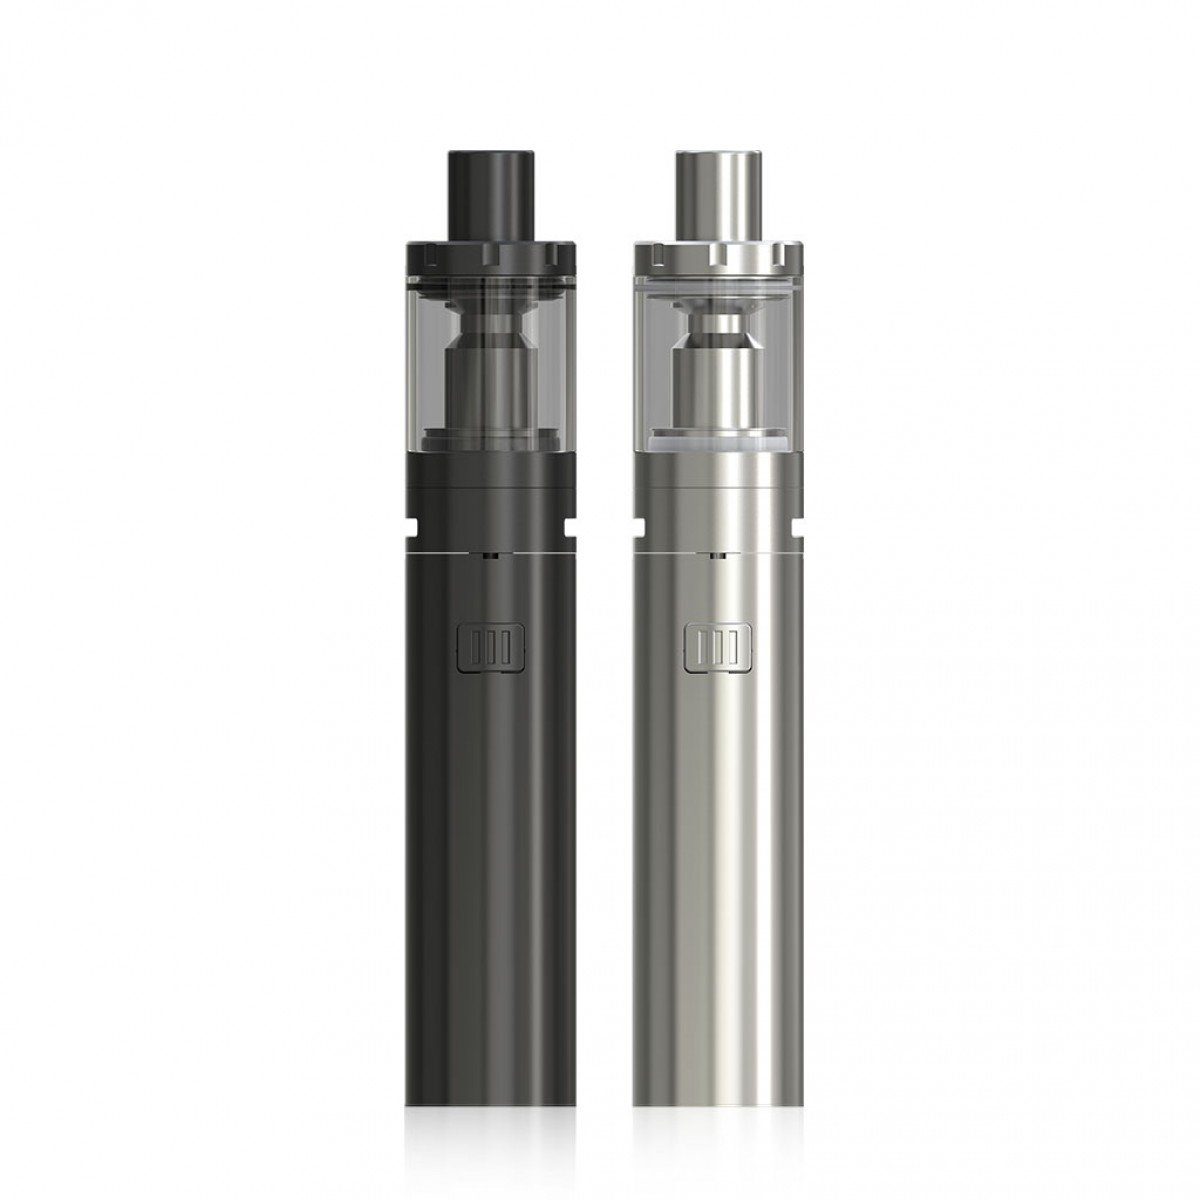 Kit Cigarro Eletrônico iJust S - 3000 mAh - Eleaf